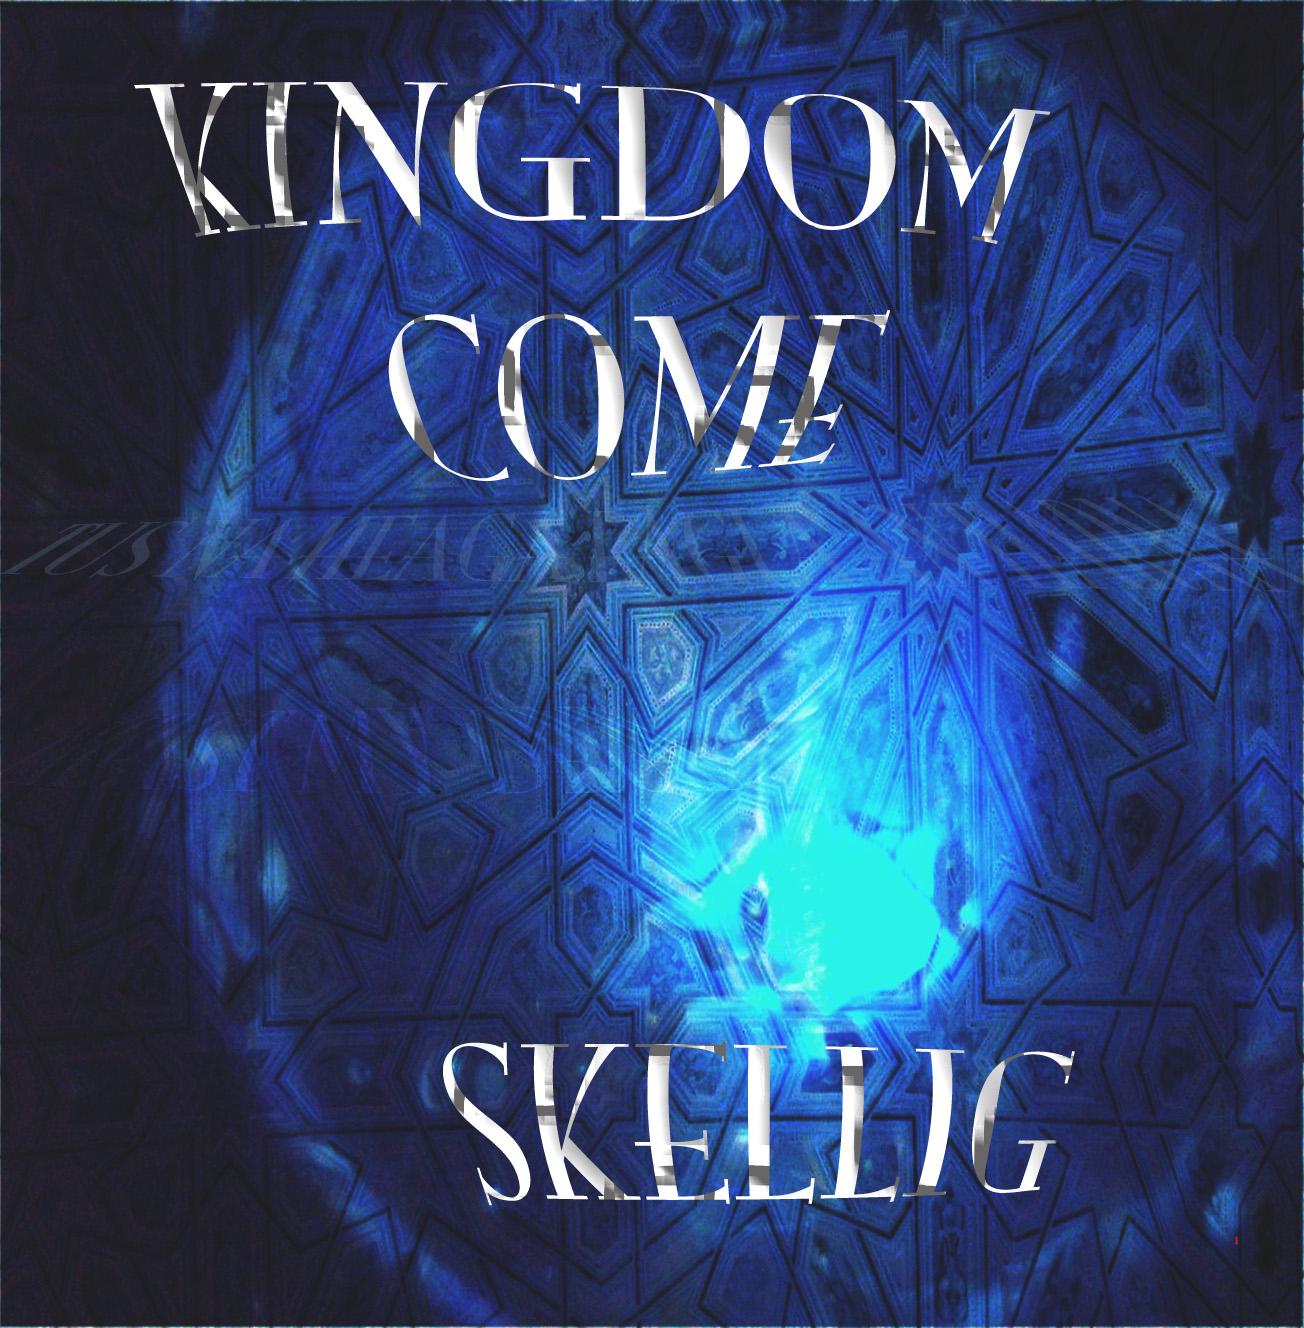 Kingdom Come 2.jpg